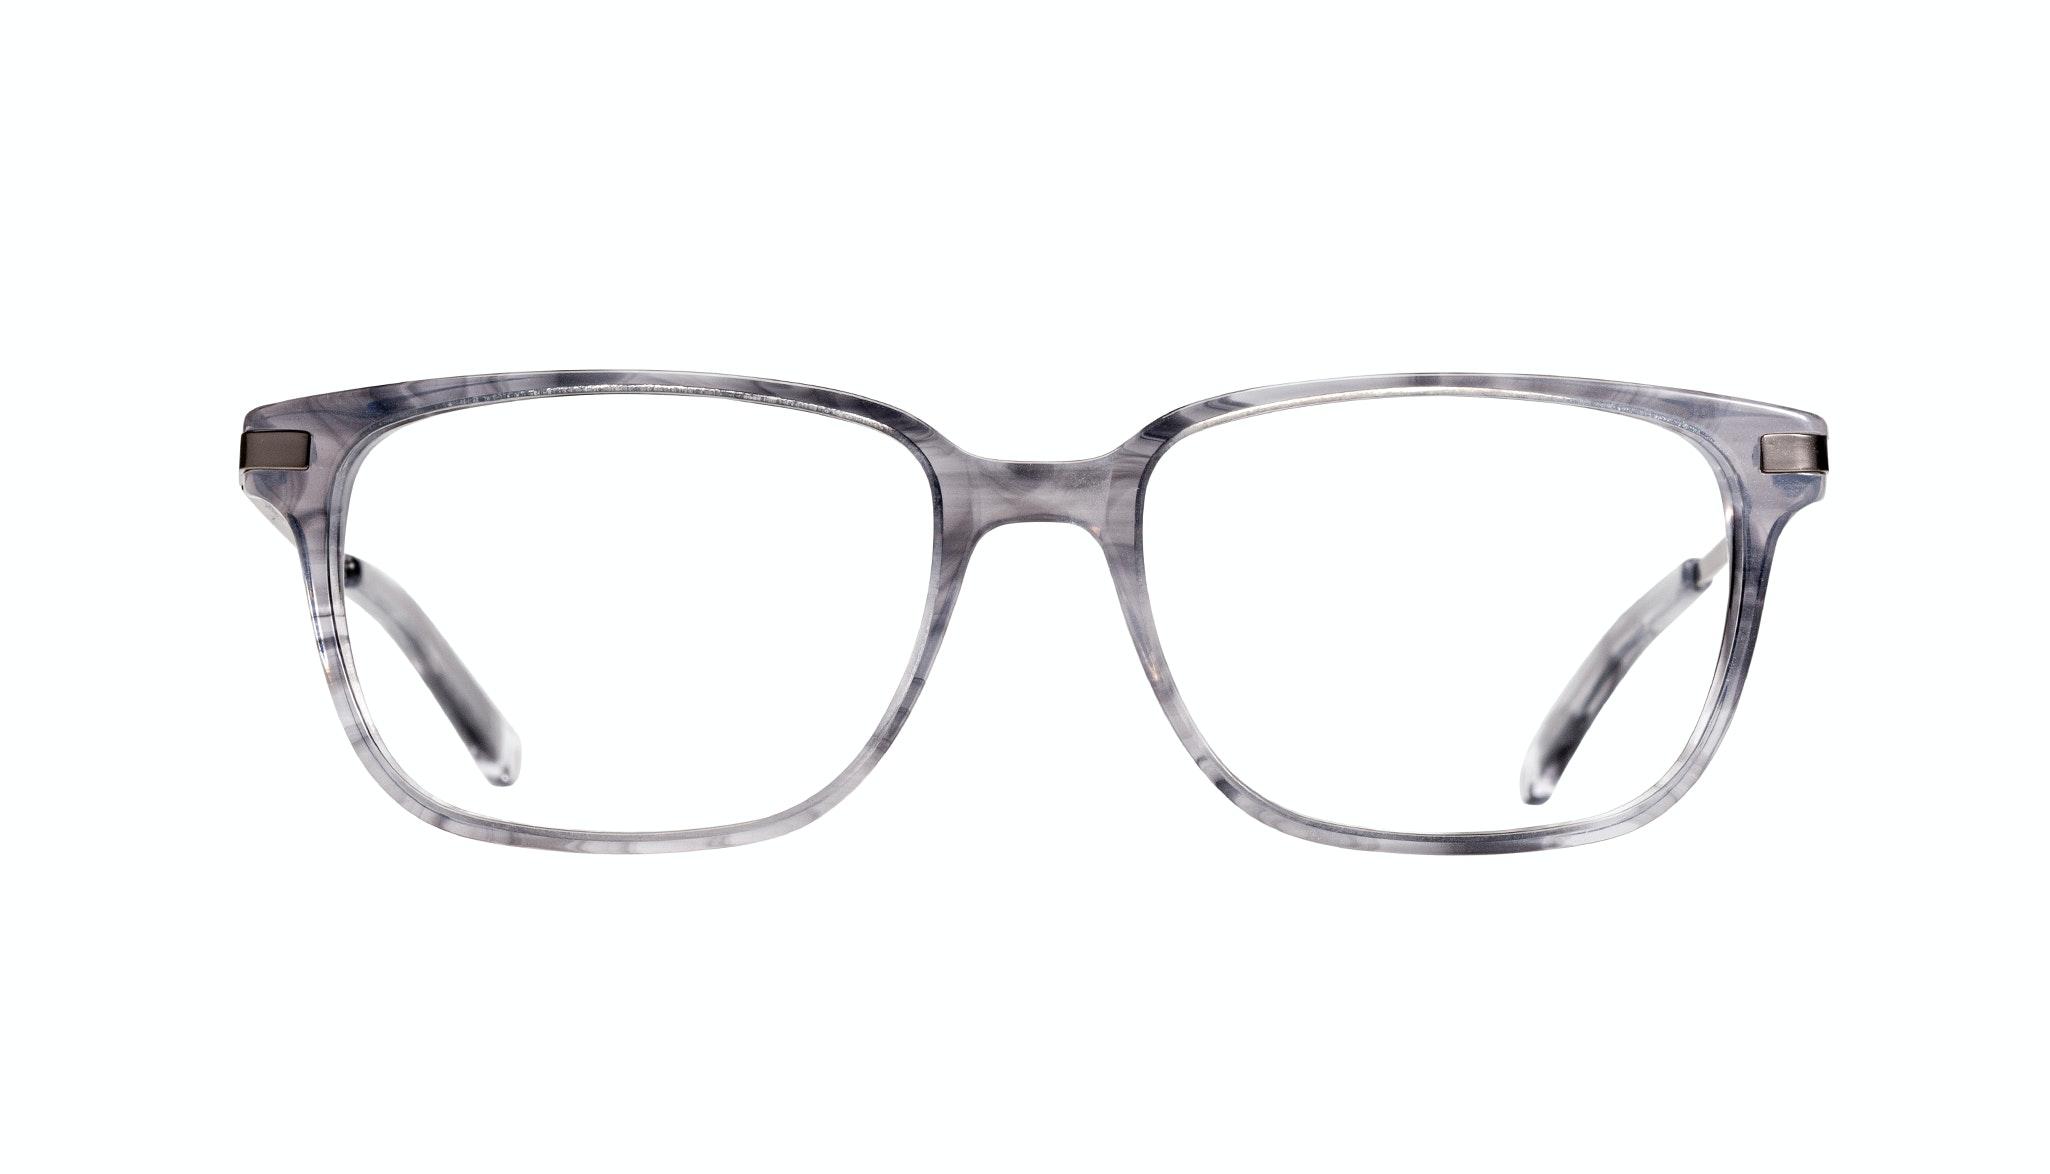 Affordable Fashion Glasses Rectangle Eyeglasses Men Trade Smokey Grey Front